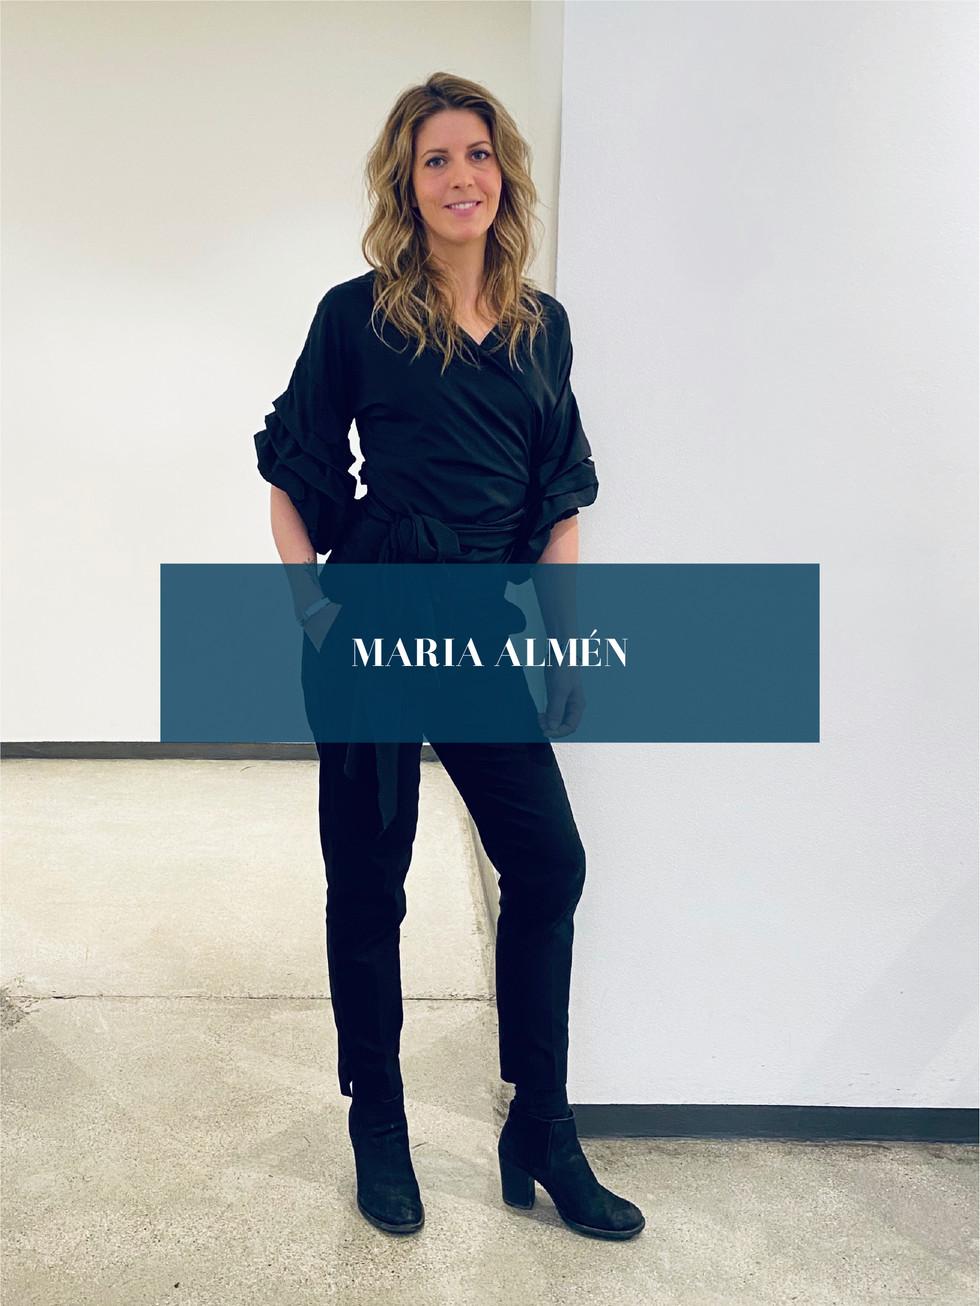 Maria Almén